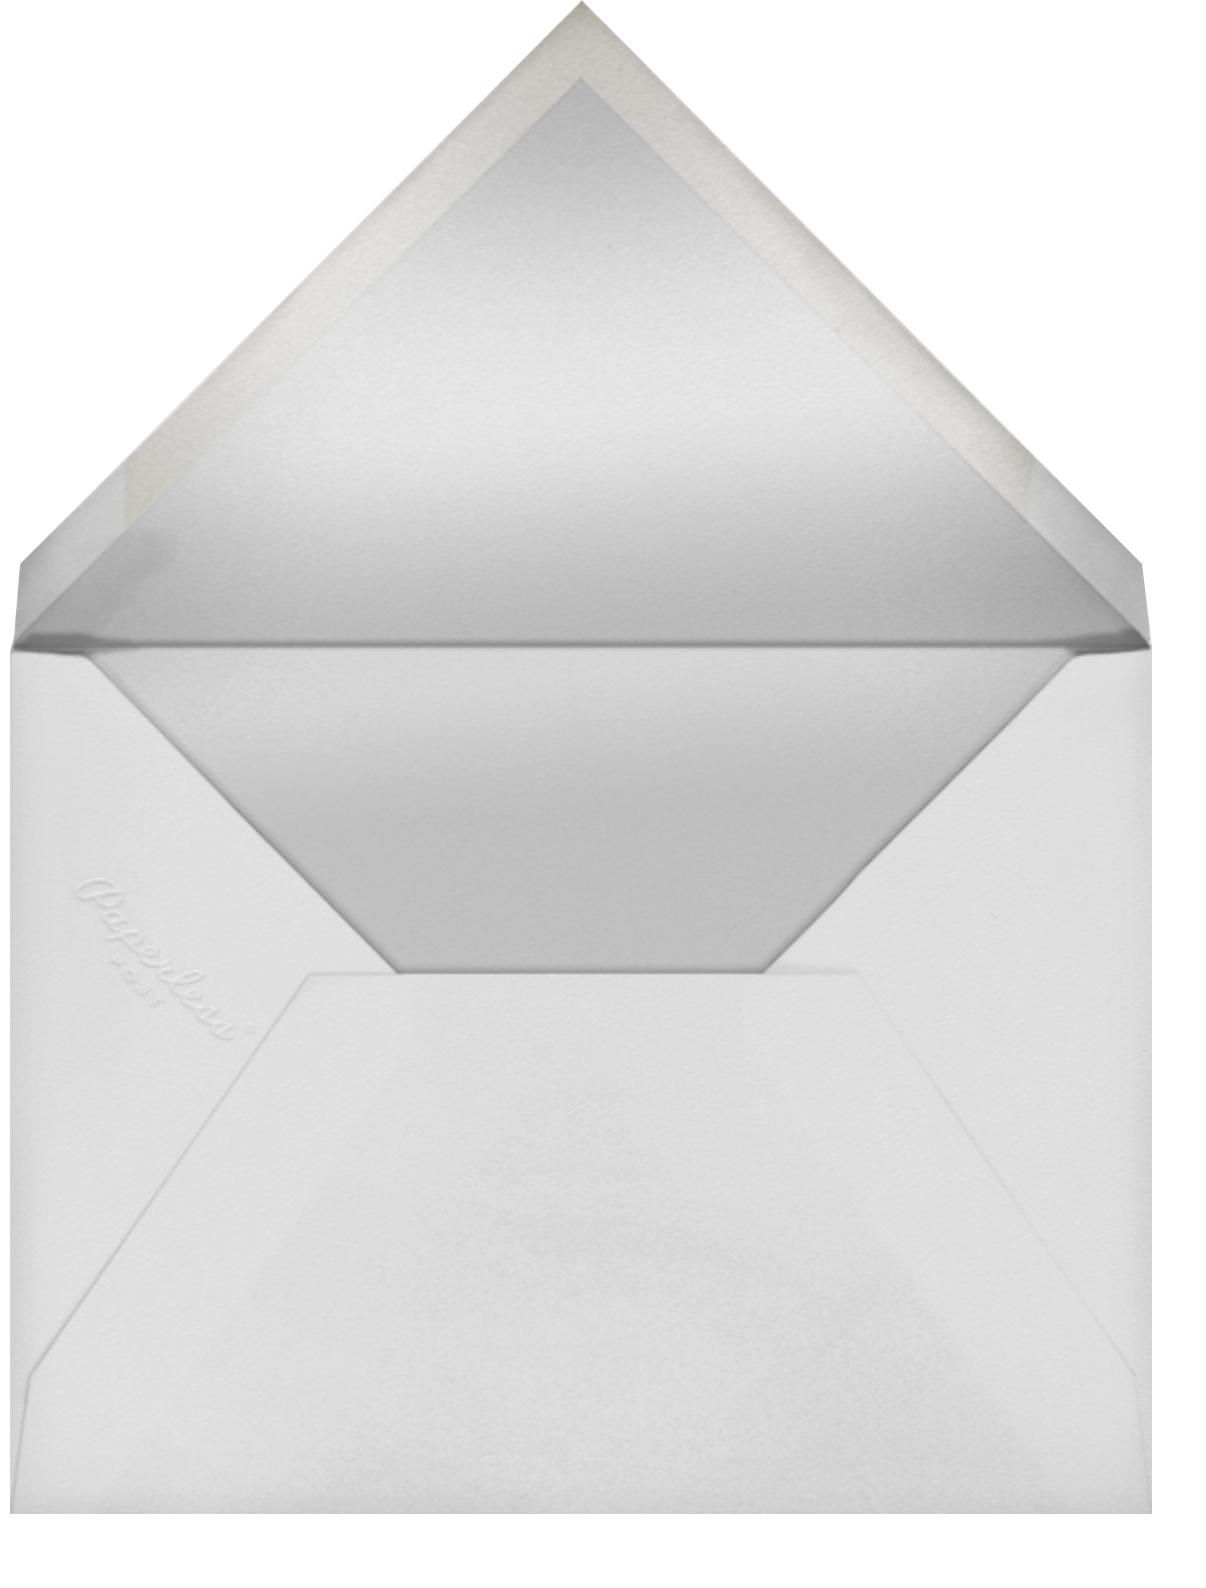 Pinecone Wreath (Menu) - Paperless Post - Envelope